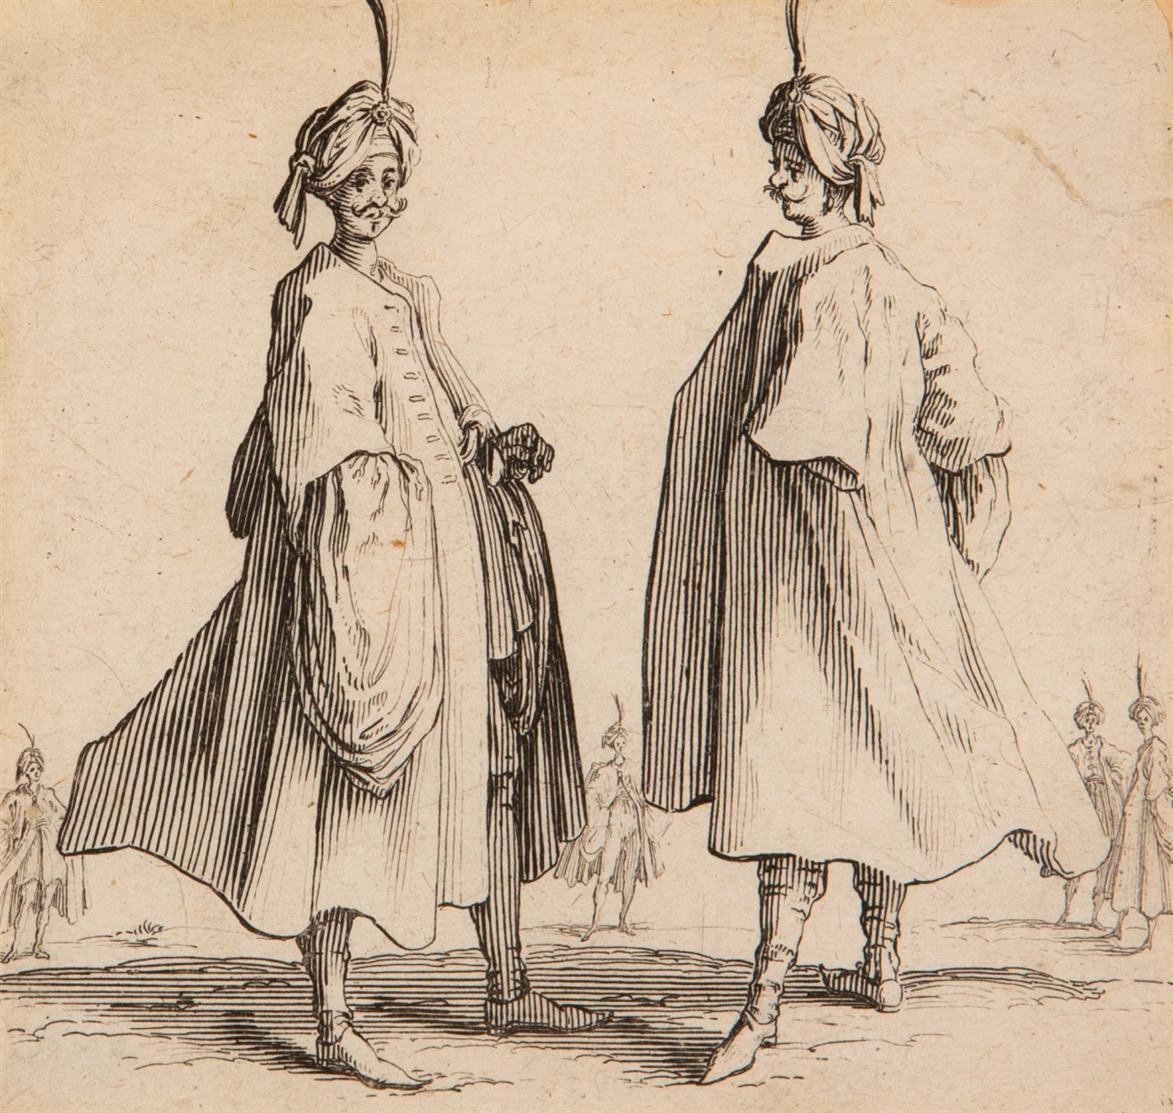 Jacques Callot. Varie Figure di Iacopo Callot. um 1617. 16 Blatt Radierungen. M.730 - 746.